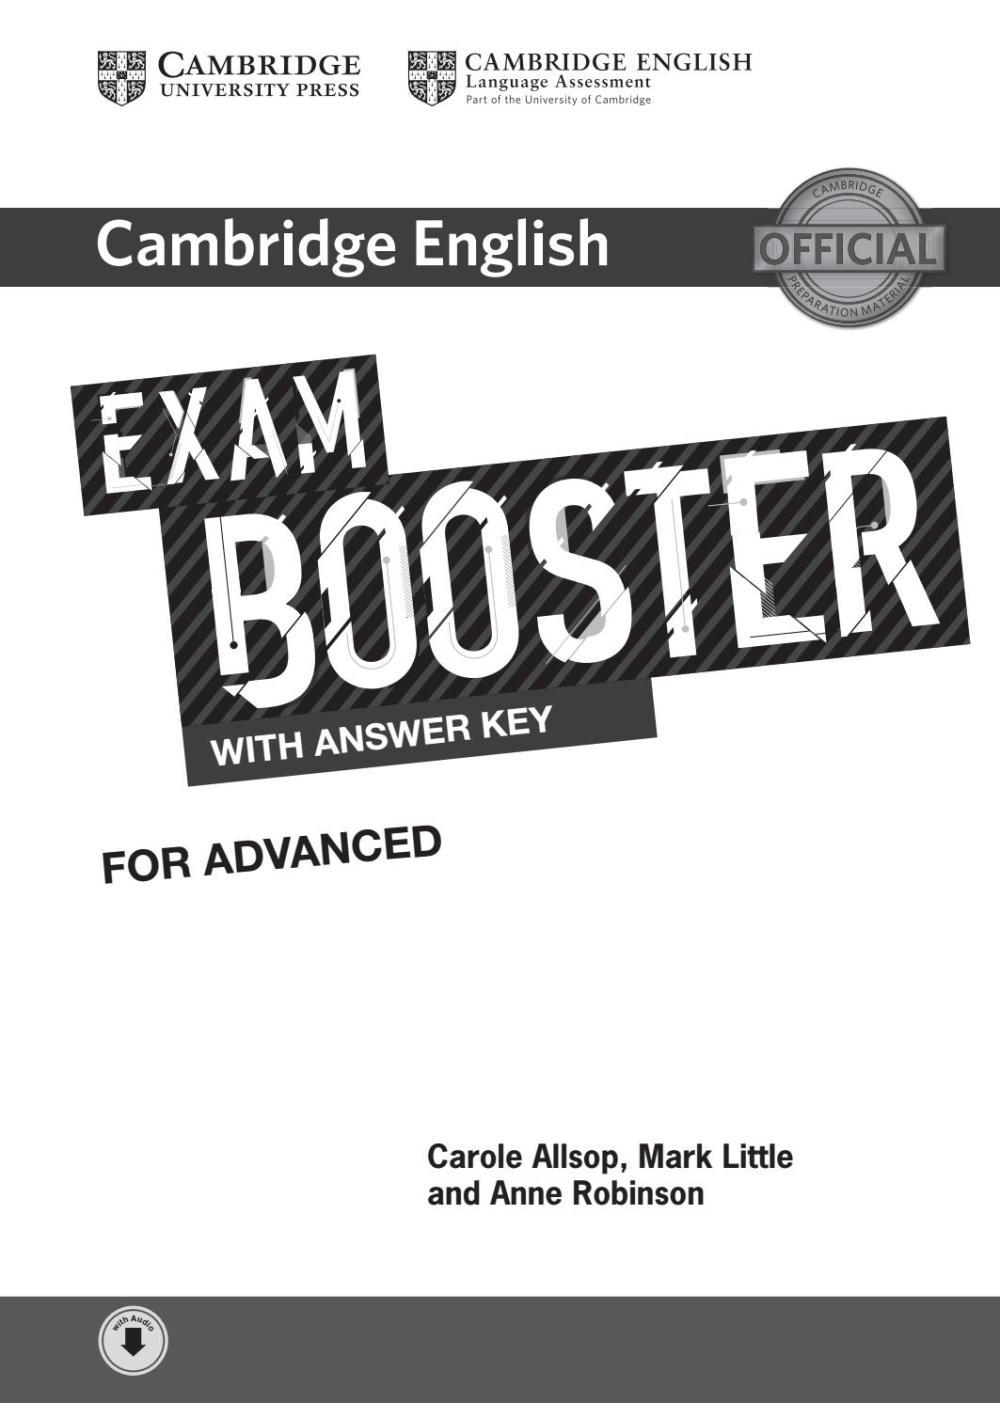 medium resolution of cae exam booster by annmargaretgarvin - issuu